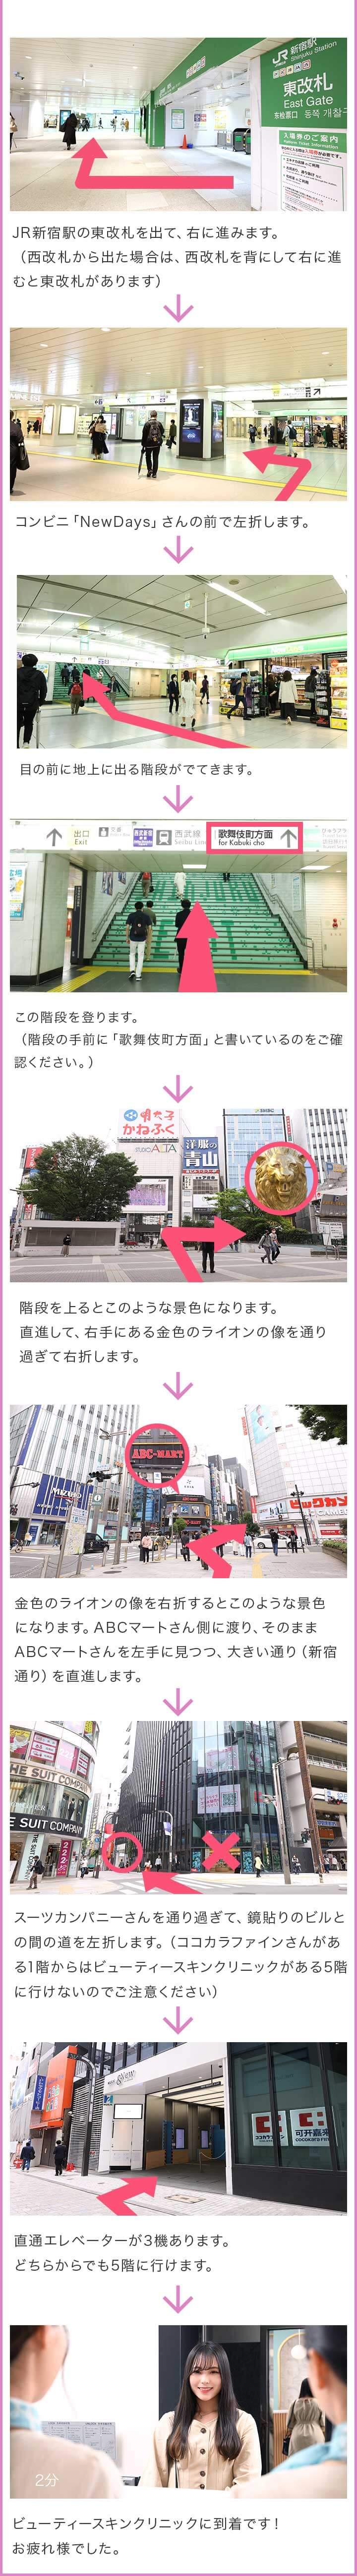 JR新宿駅 東改札からの行き方